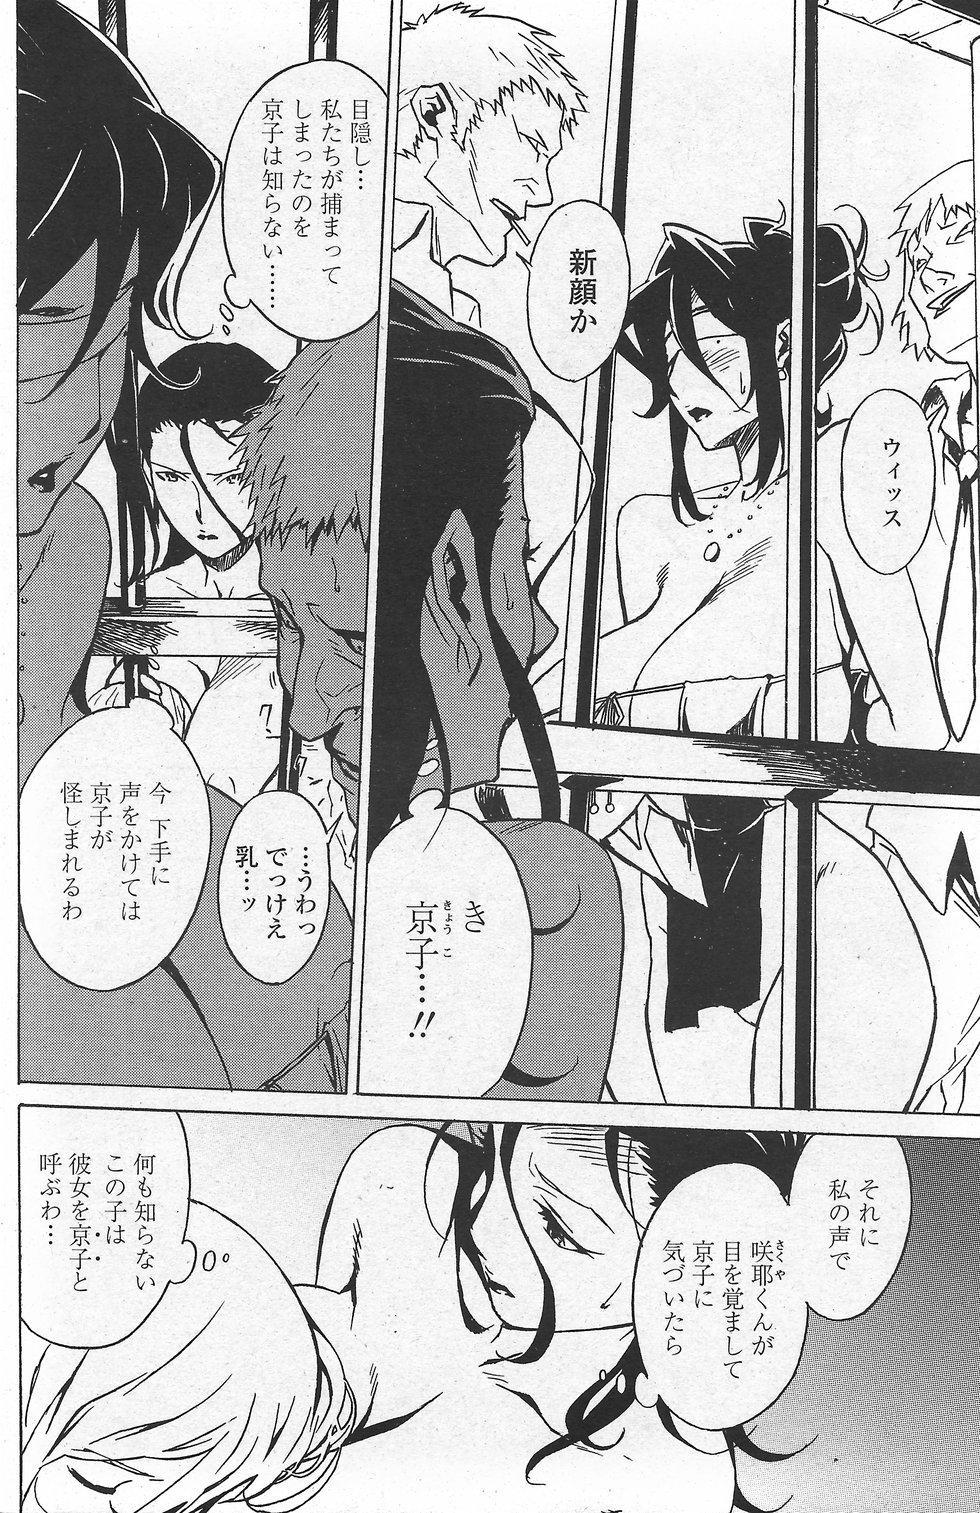 COMIC Penguin Club Sanzokuban 2007-10 Vol. 225 119